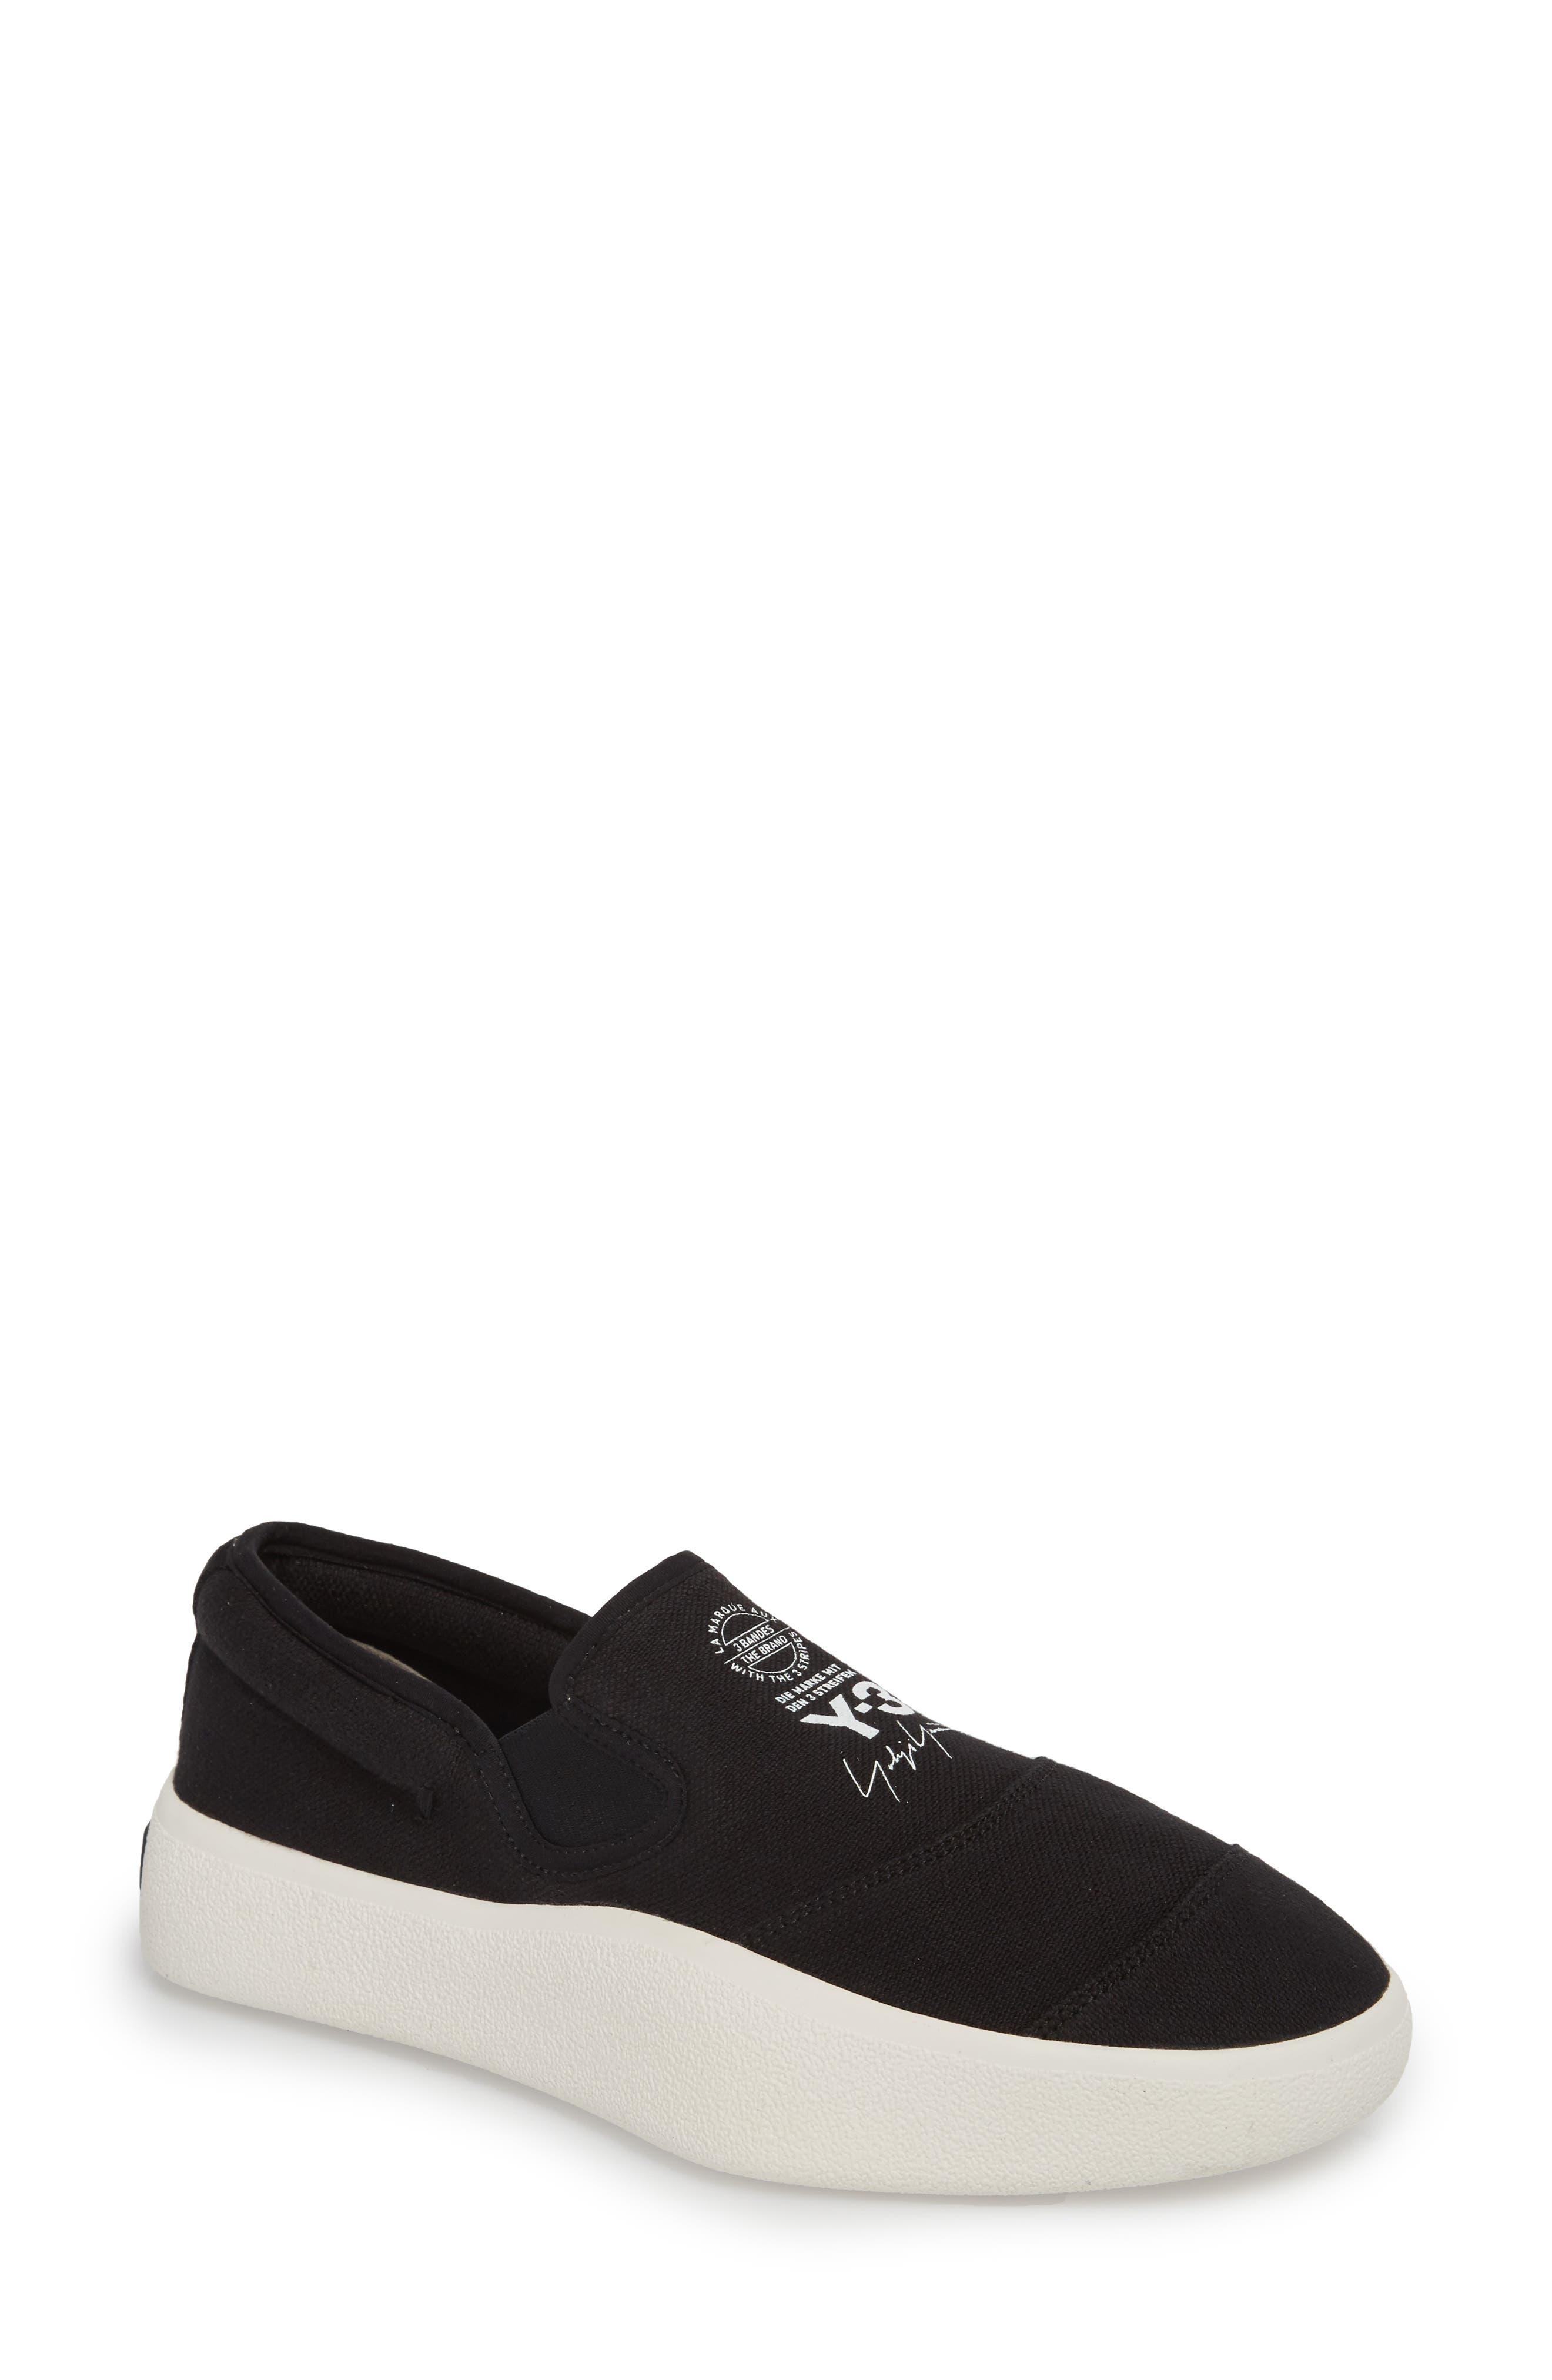 Tangutsu Slip-On Sneaker,                             Main thumbnail 1, color,                             001